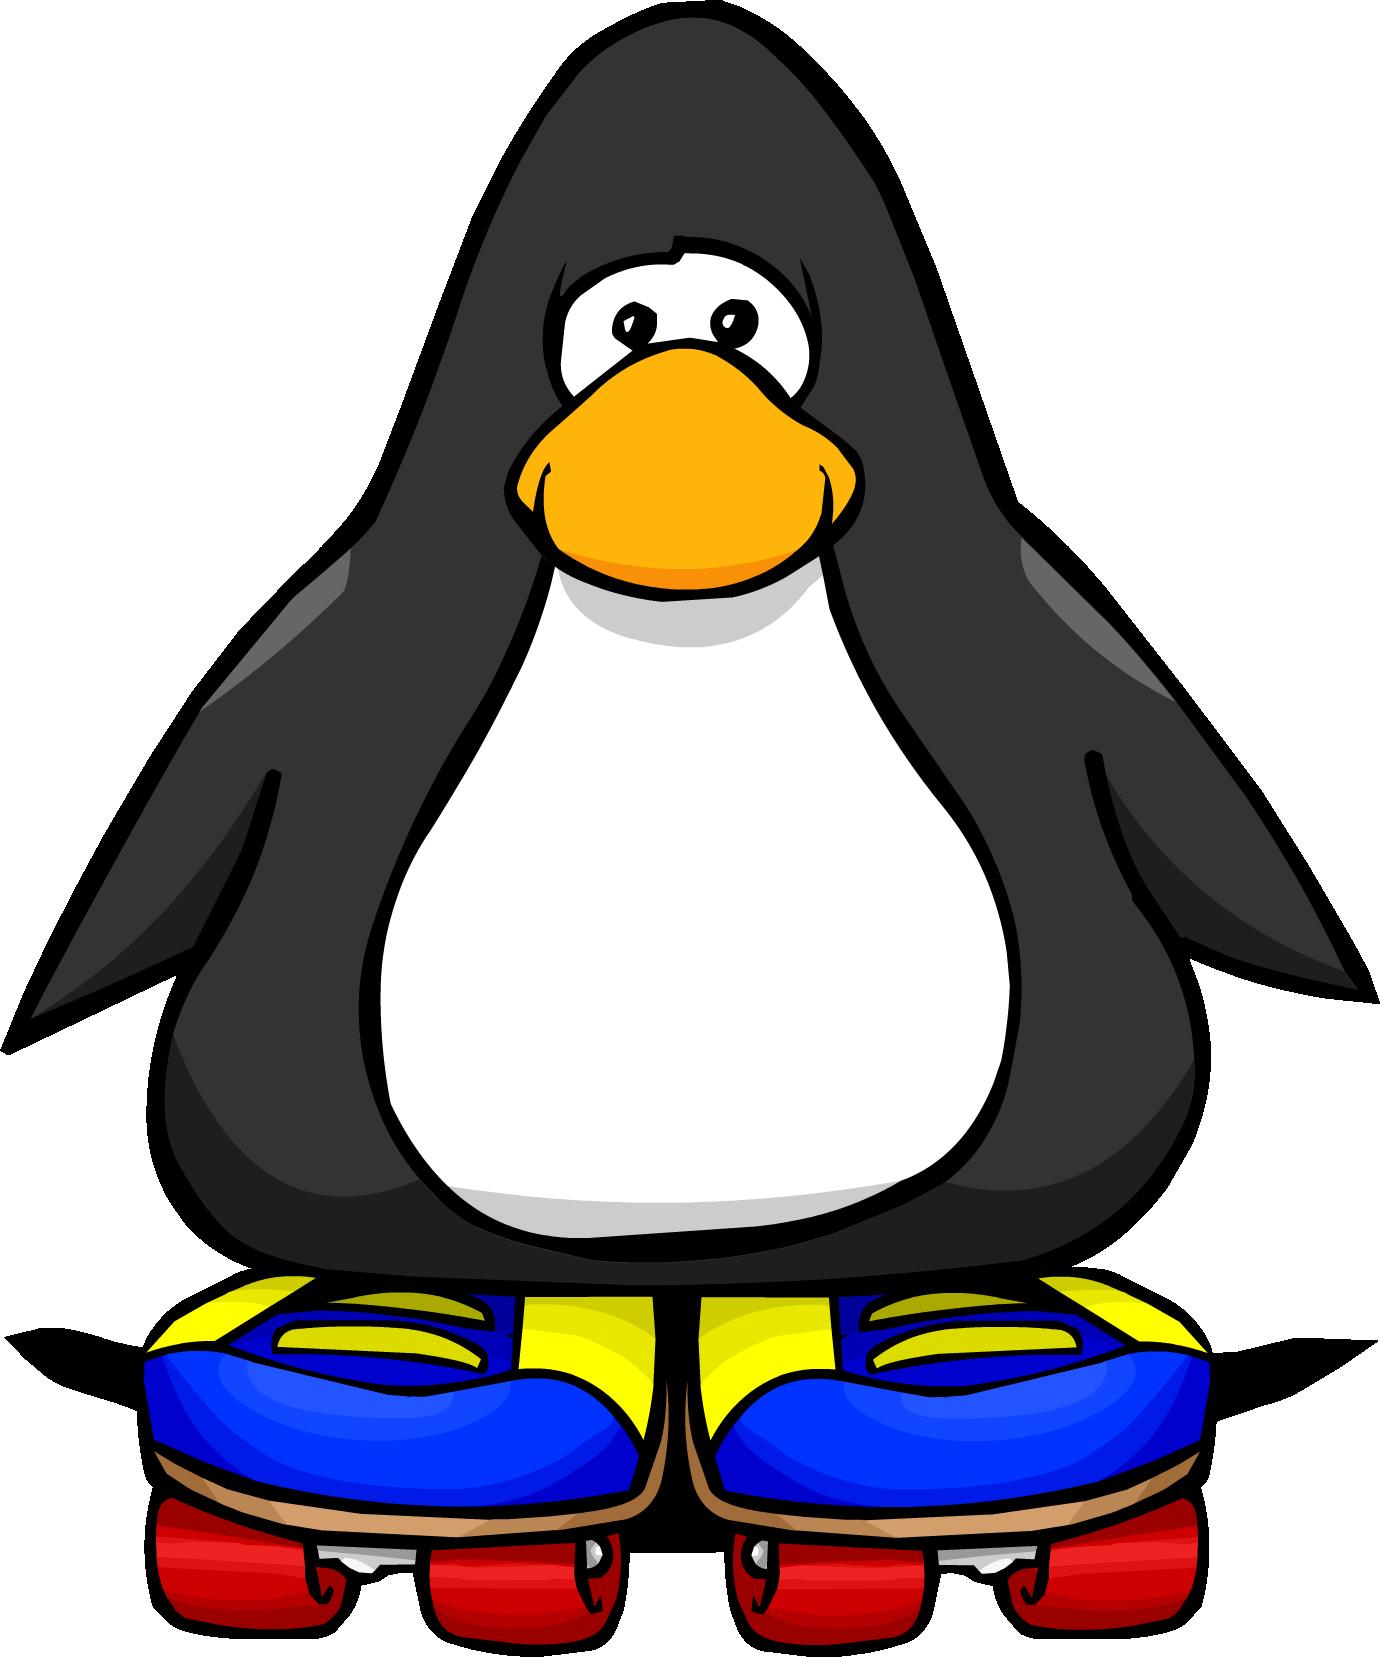 Image result for penguin on roller skates clip art